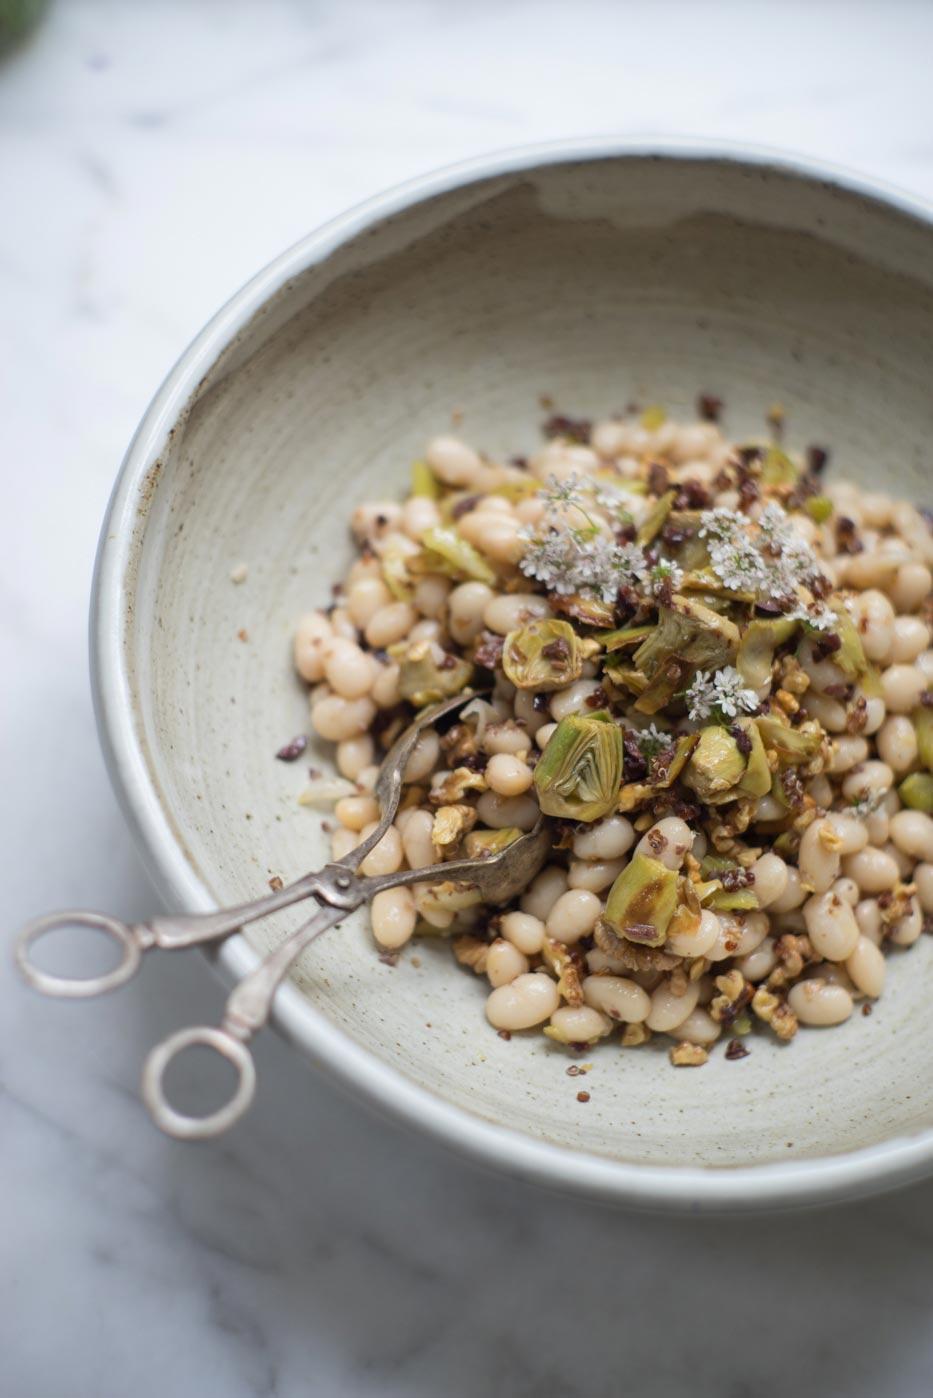 Cocagne Bean & Artichoke Salad